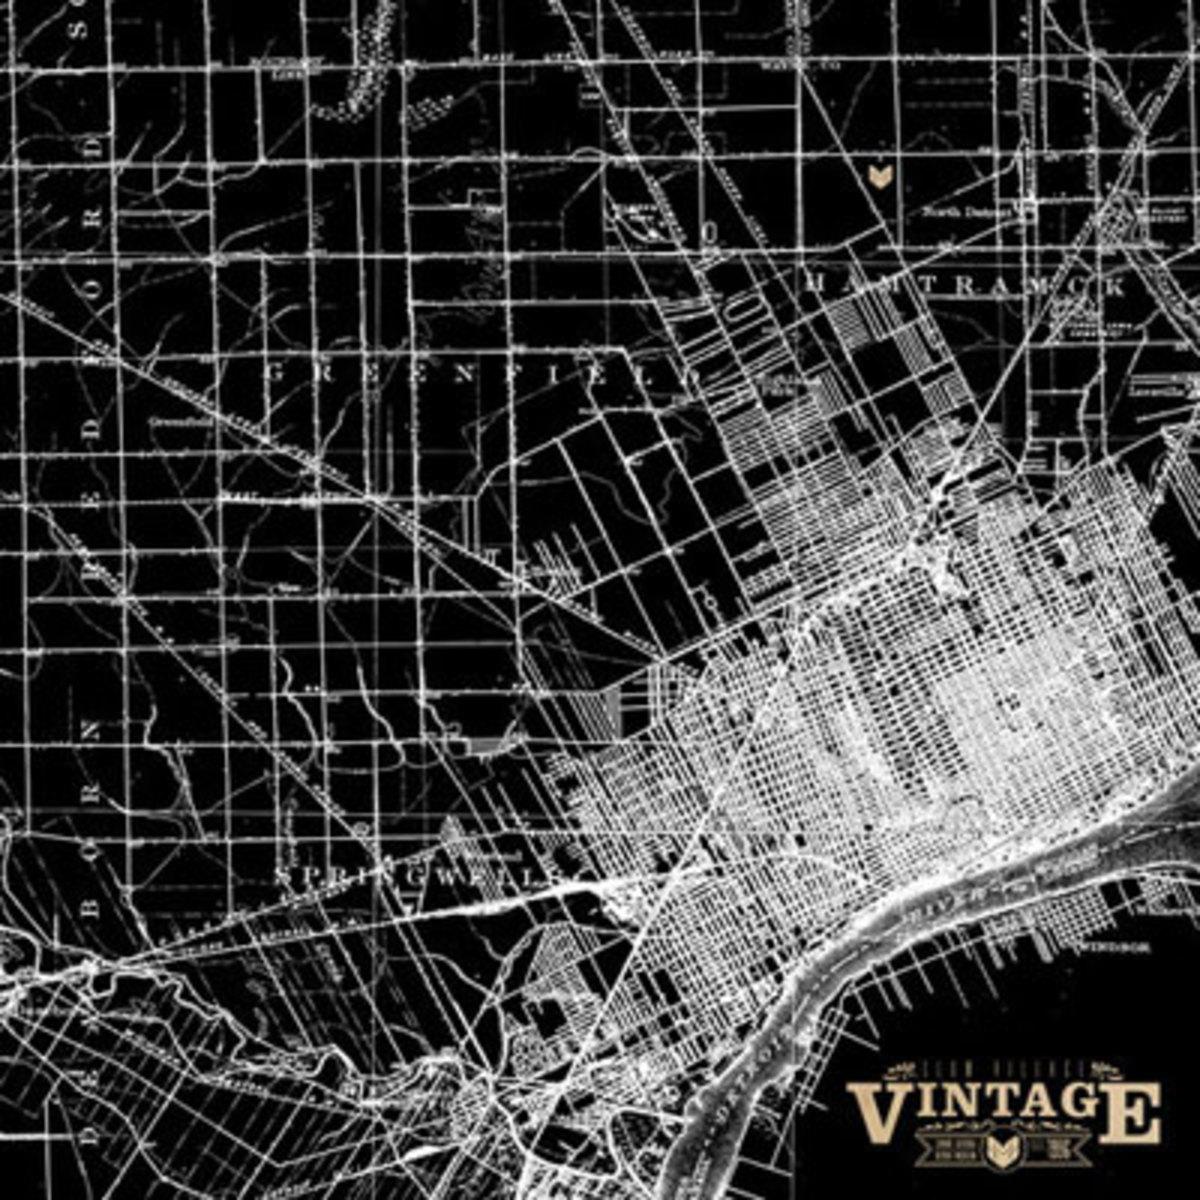 slumvillage-vintage.jpg